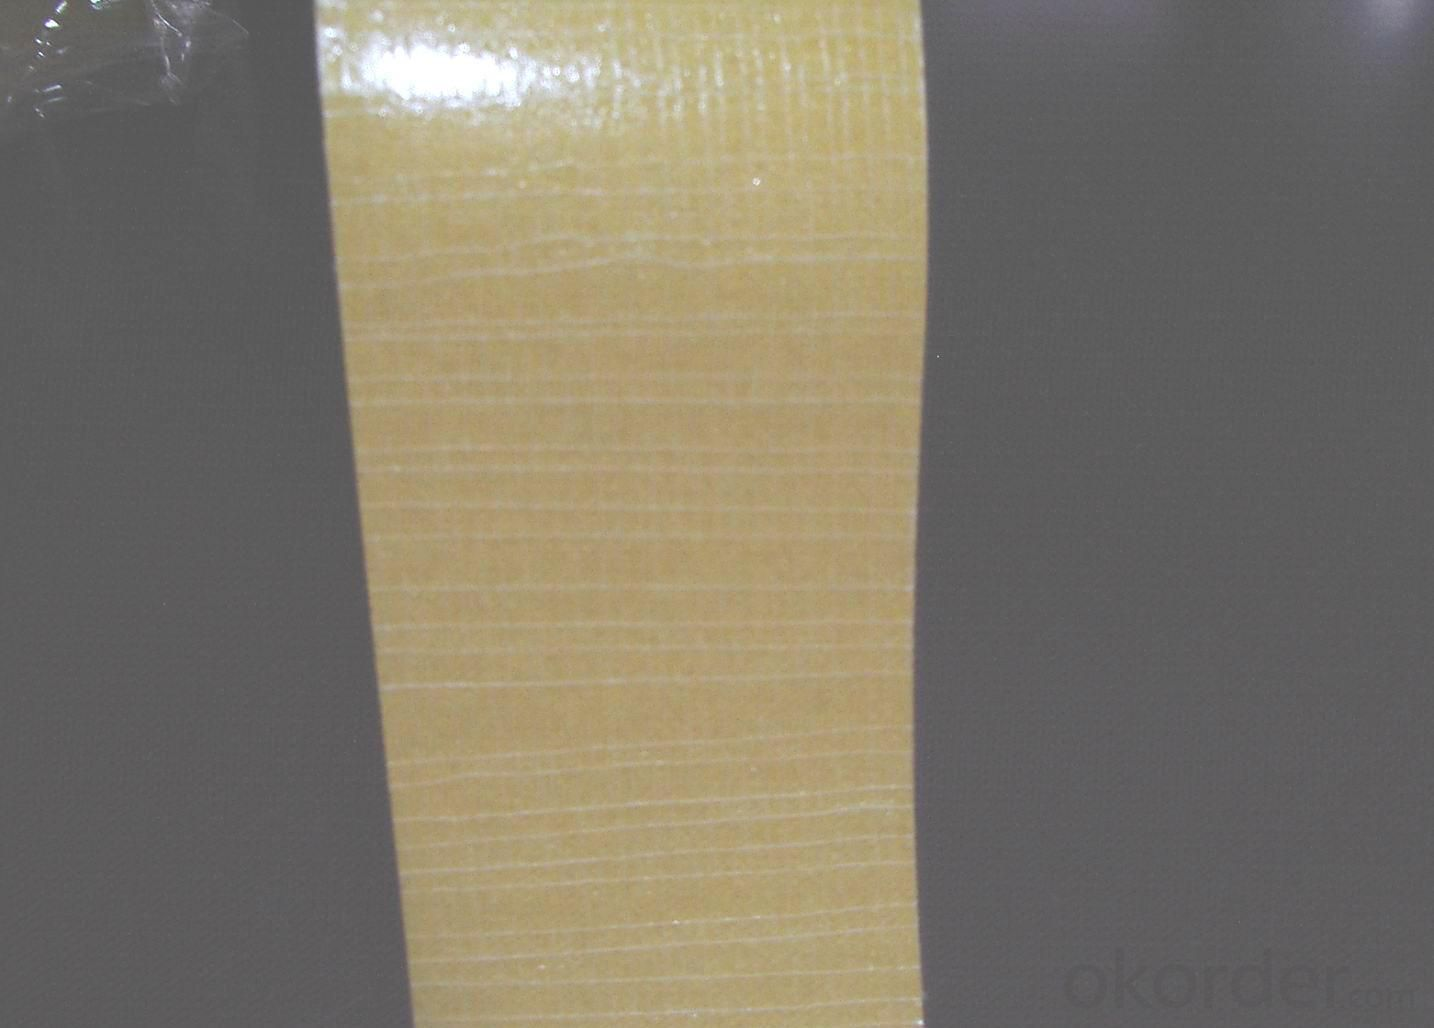 Double Sided Transfer Mesh Tape DSM-3875 For Industry